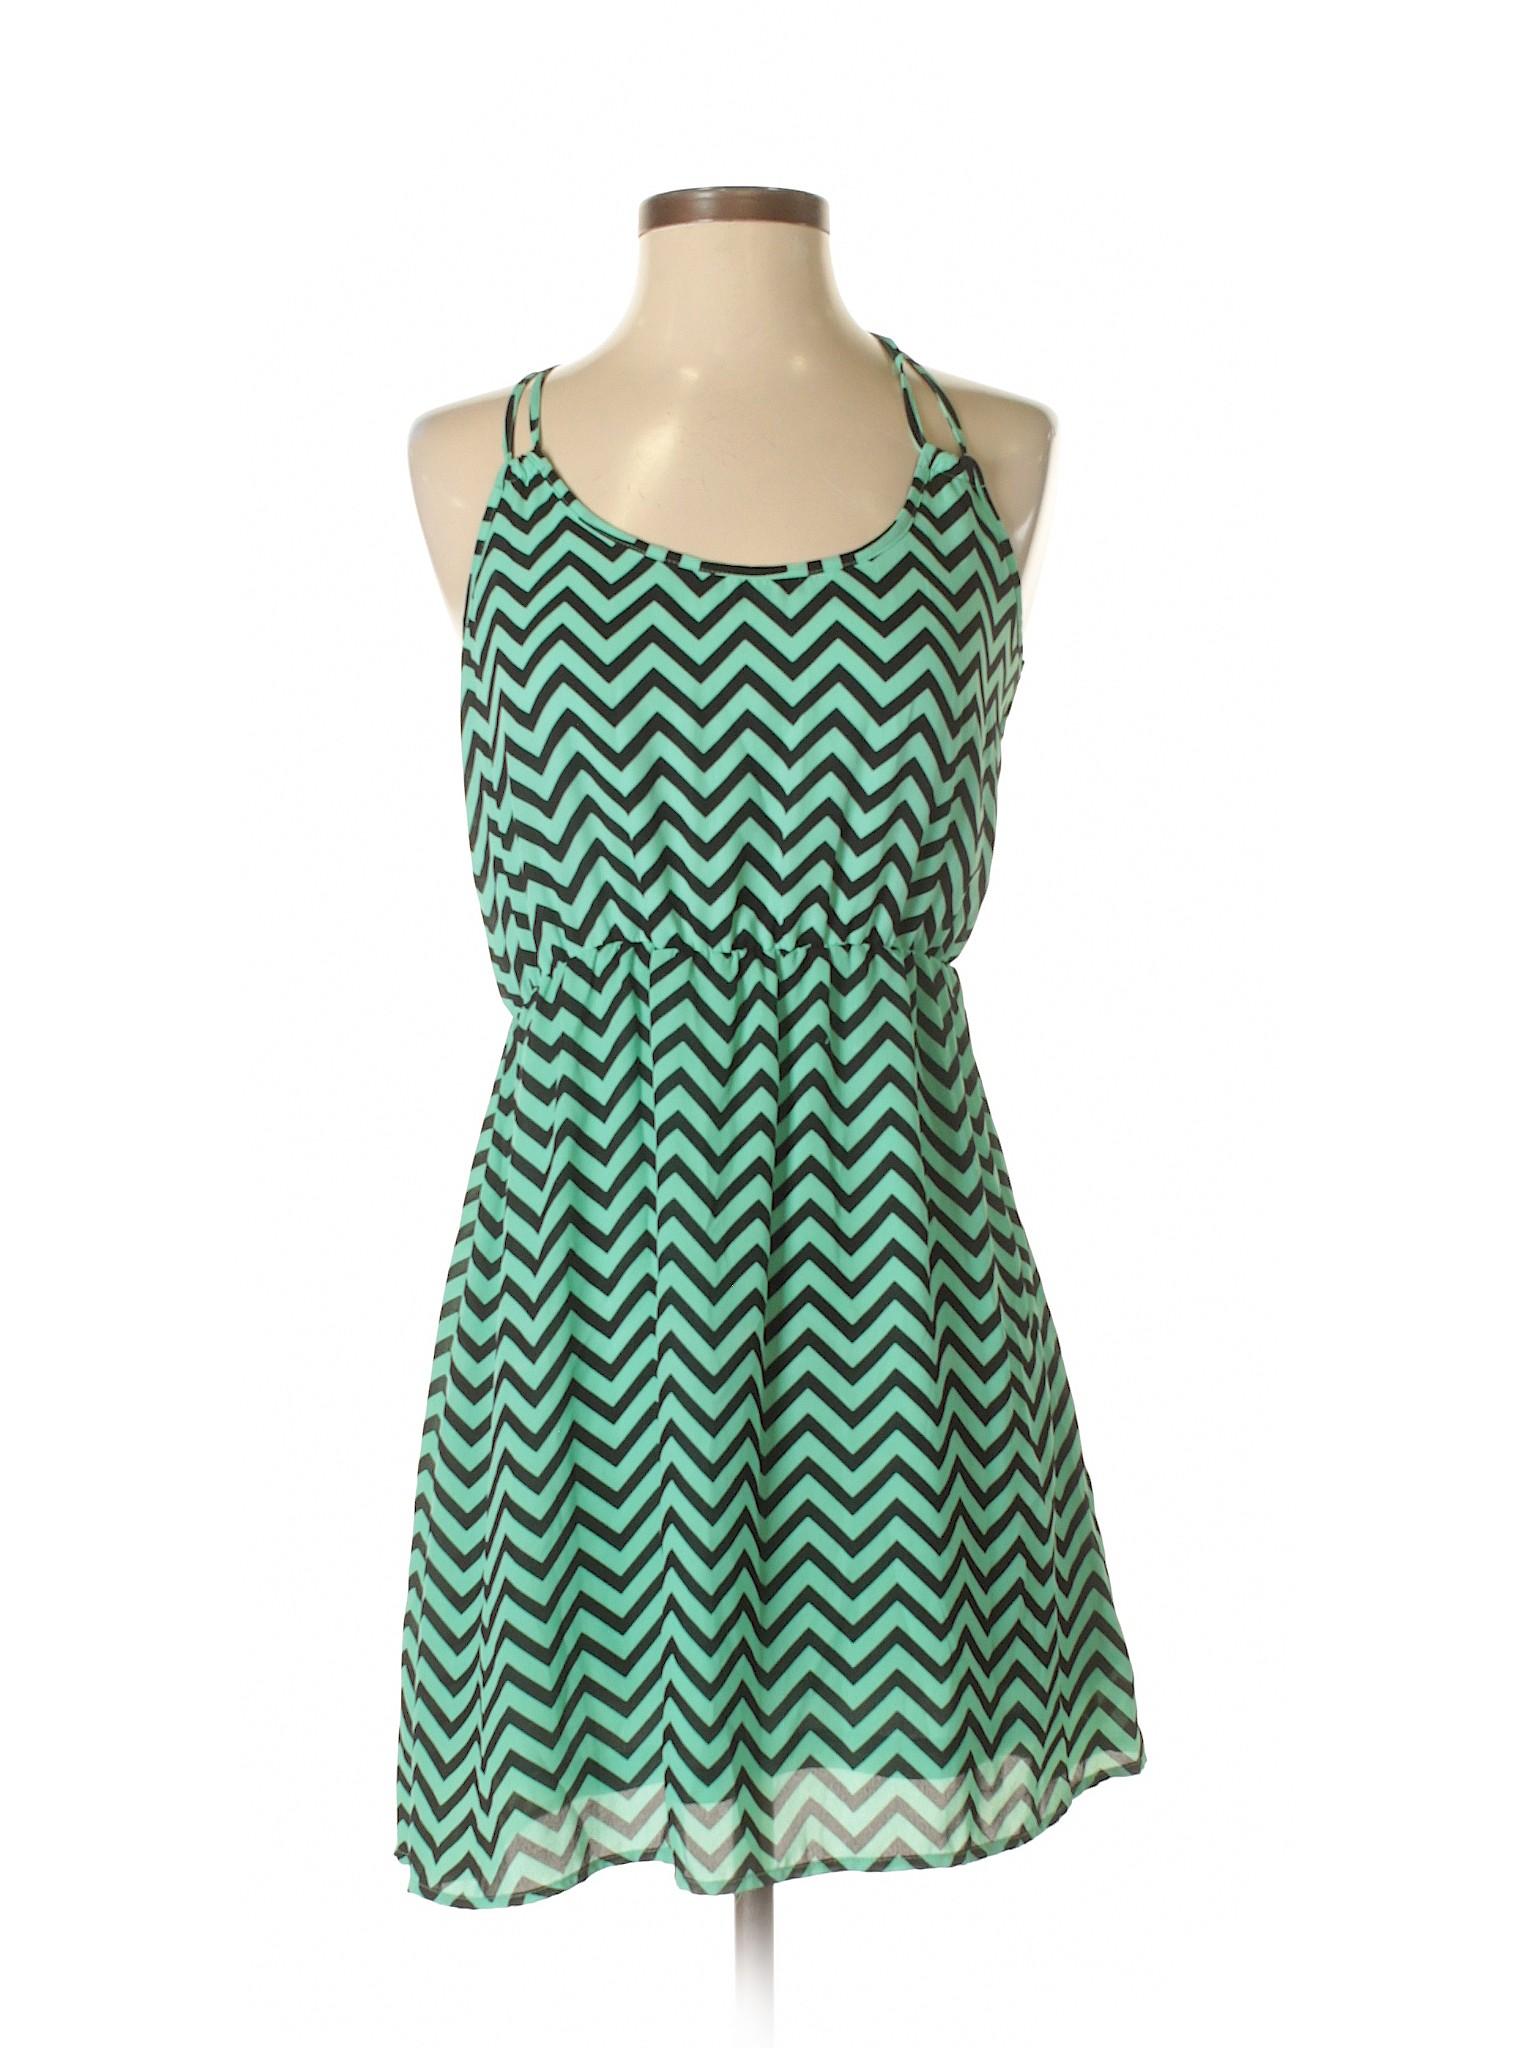 Annabella Dress winter Boutique Boutique winter Casual qwBzF4nx